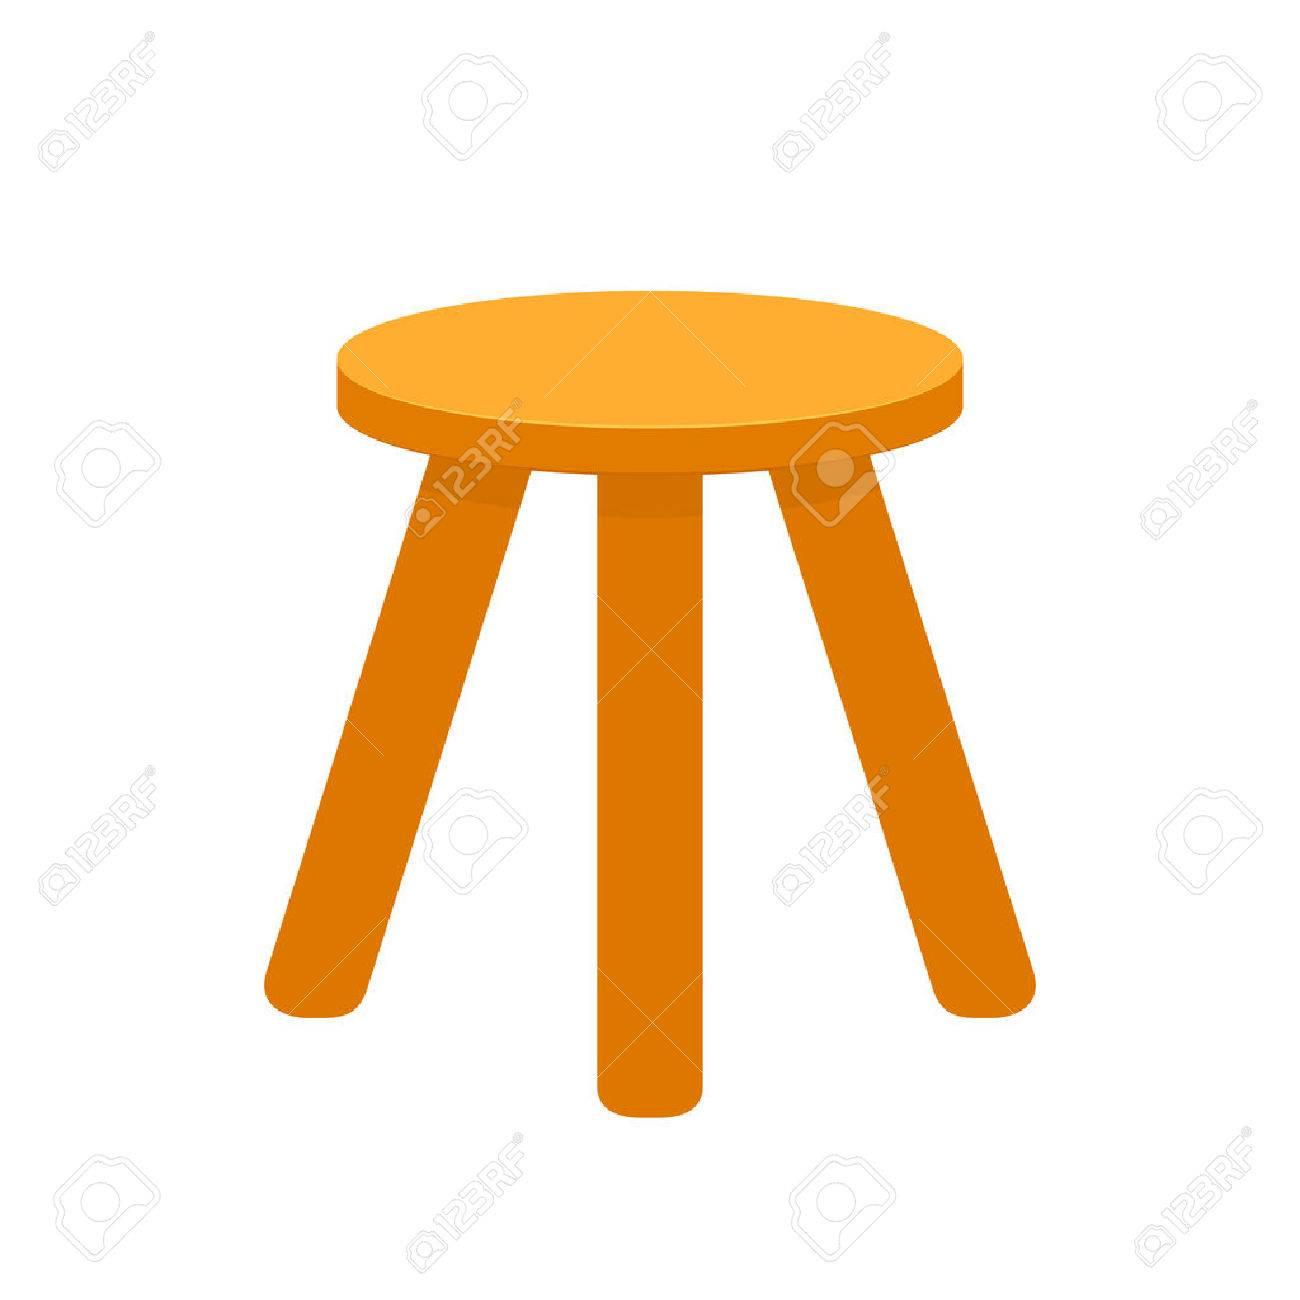 three legged stool - 80089589